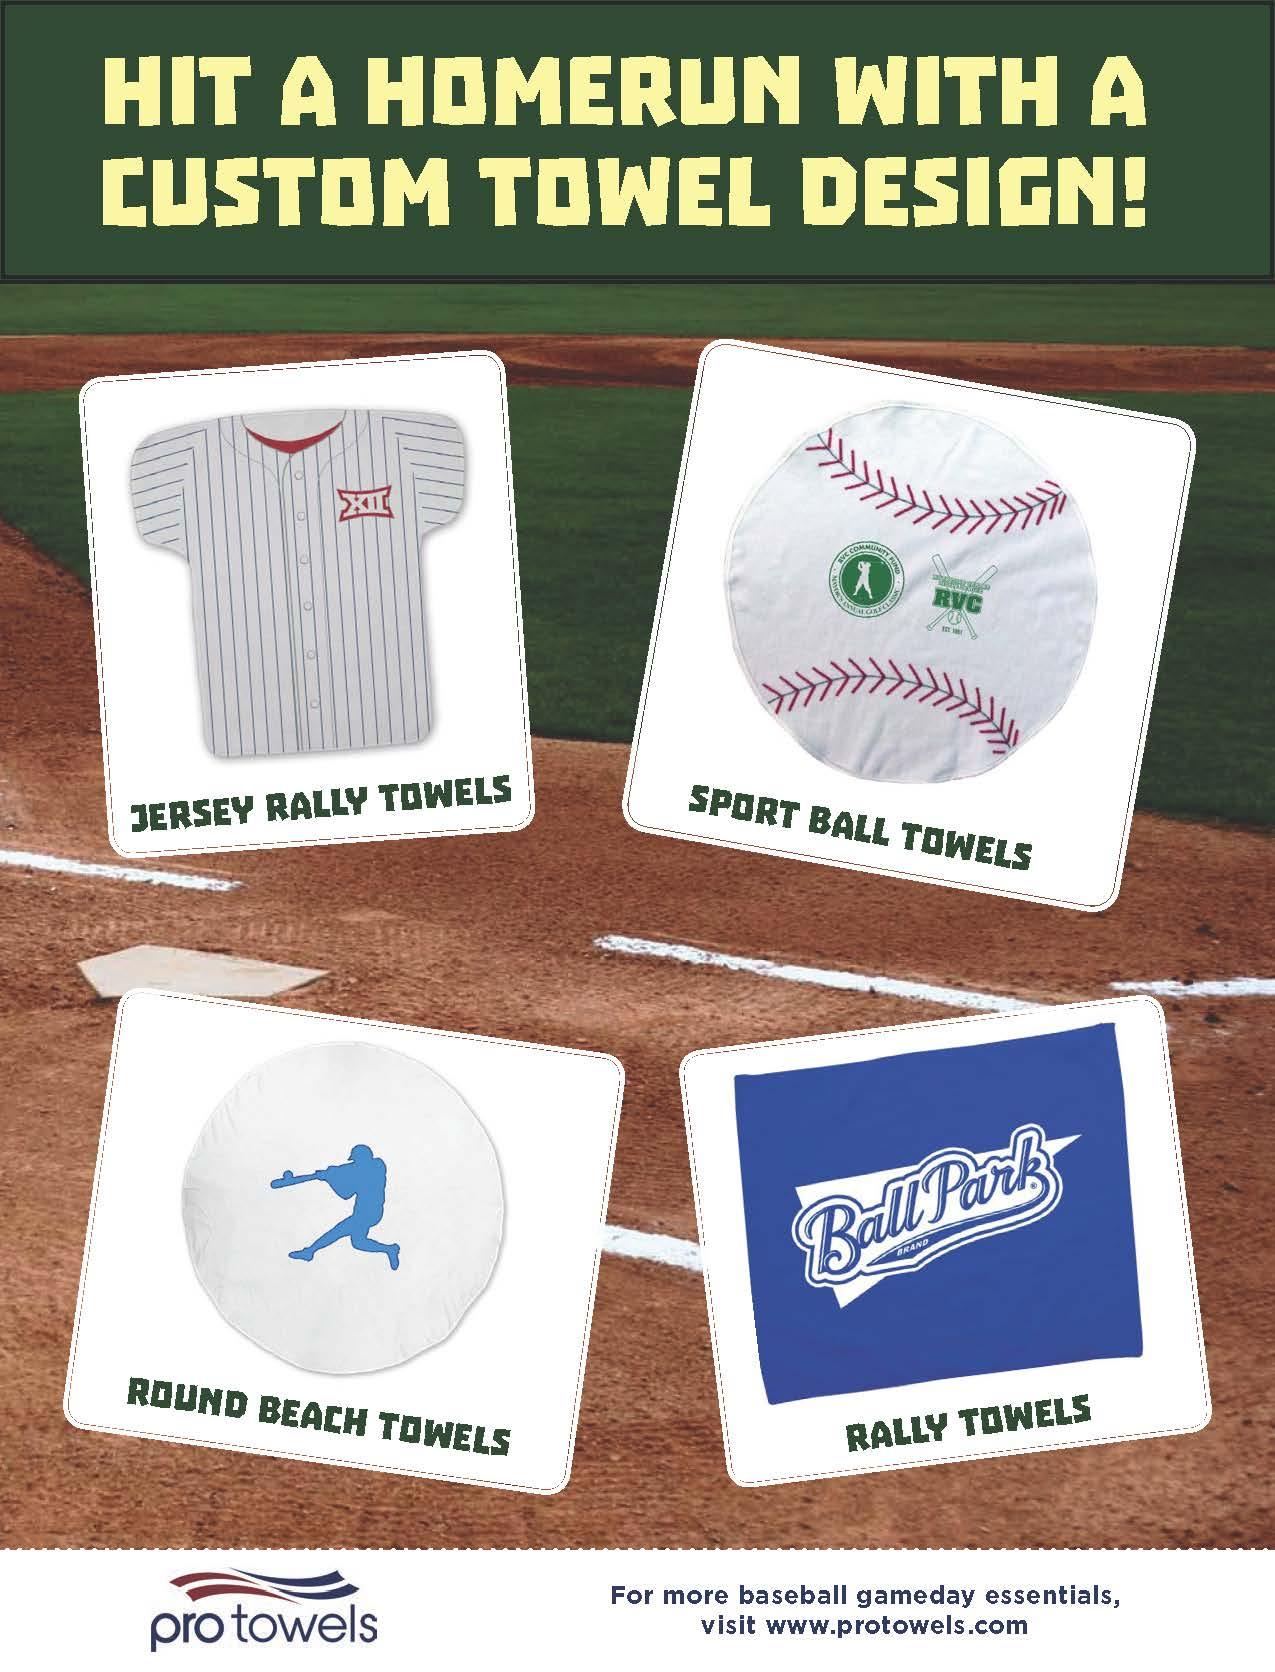 Baseball Gameday Essentials